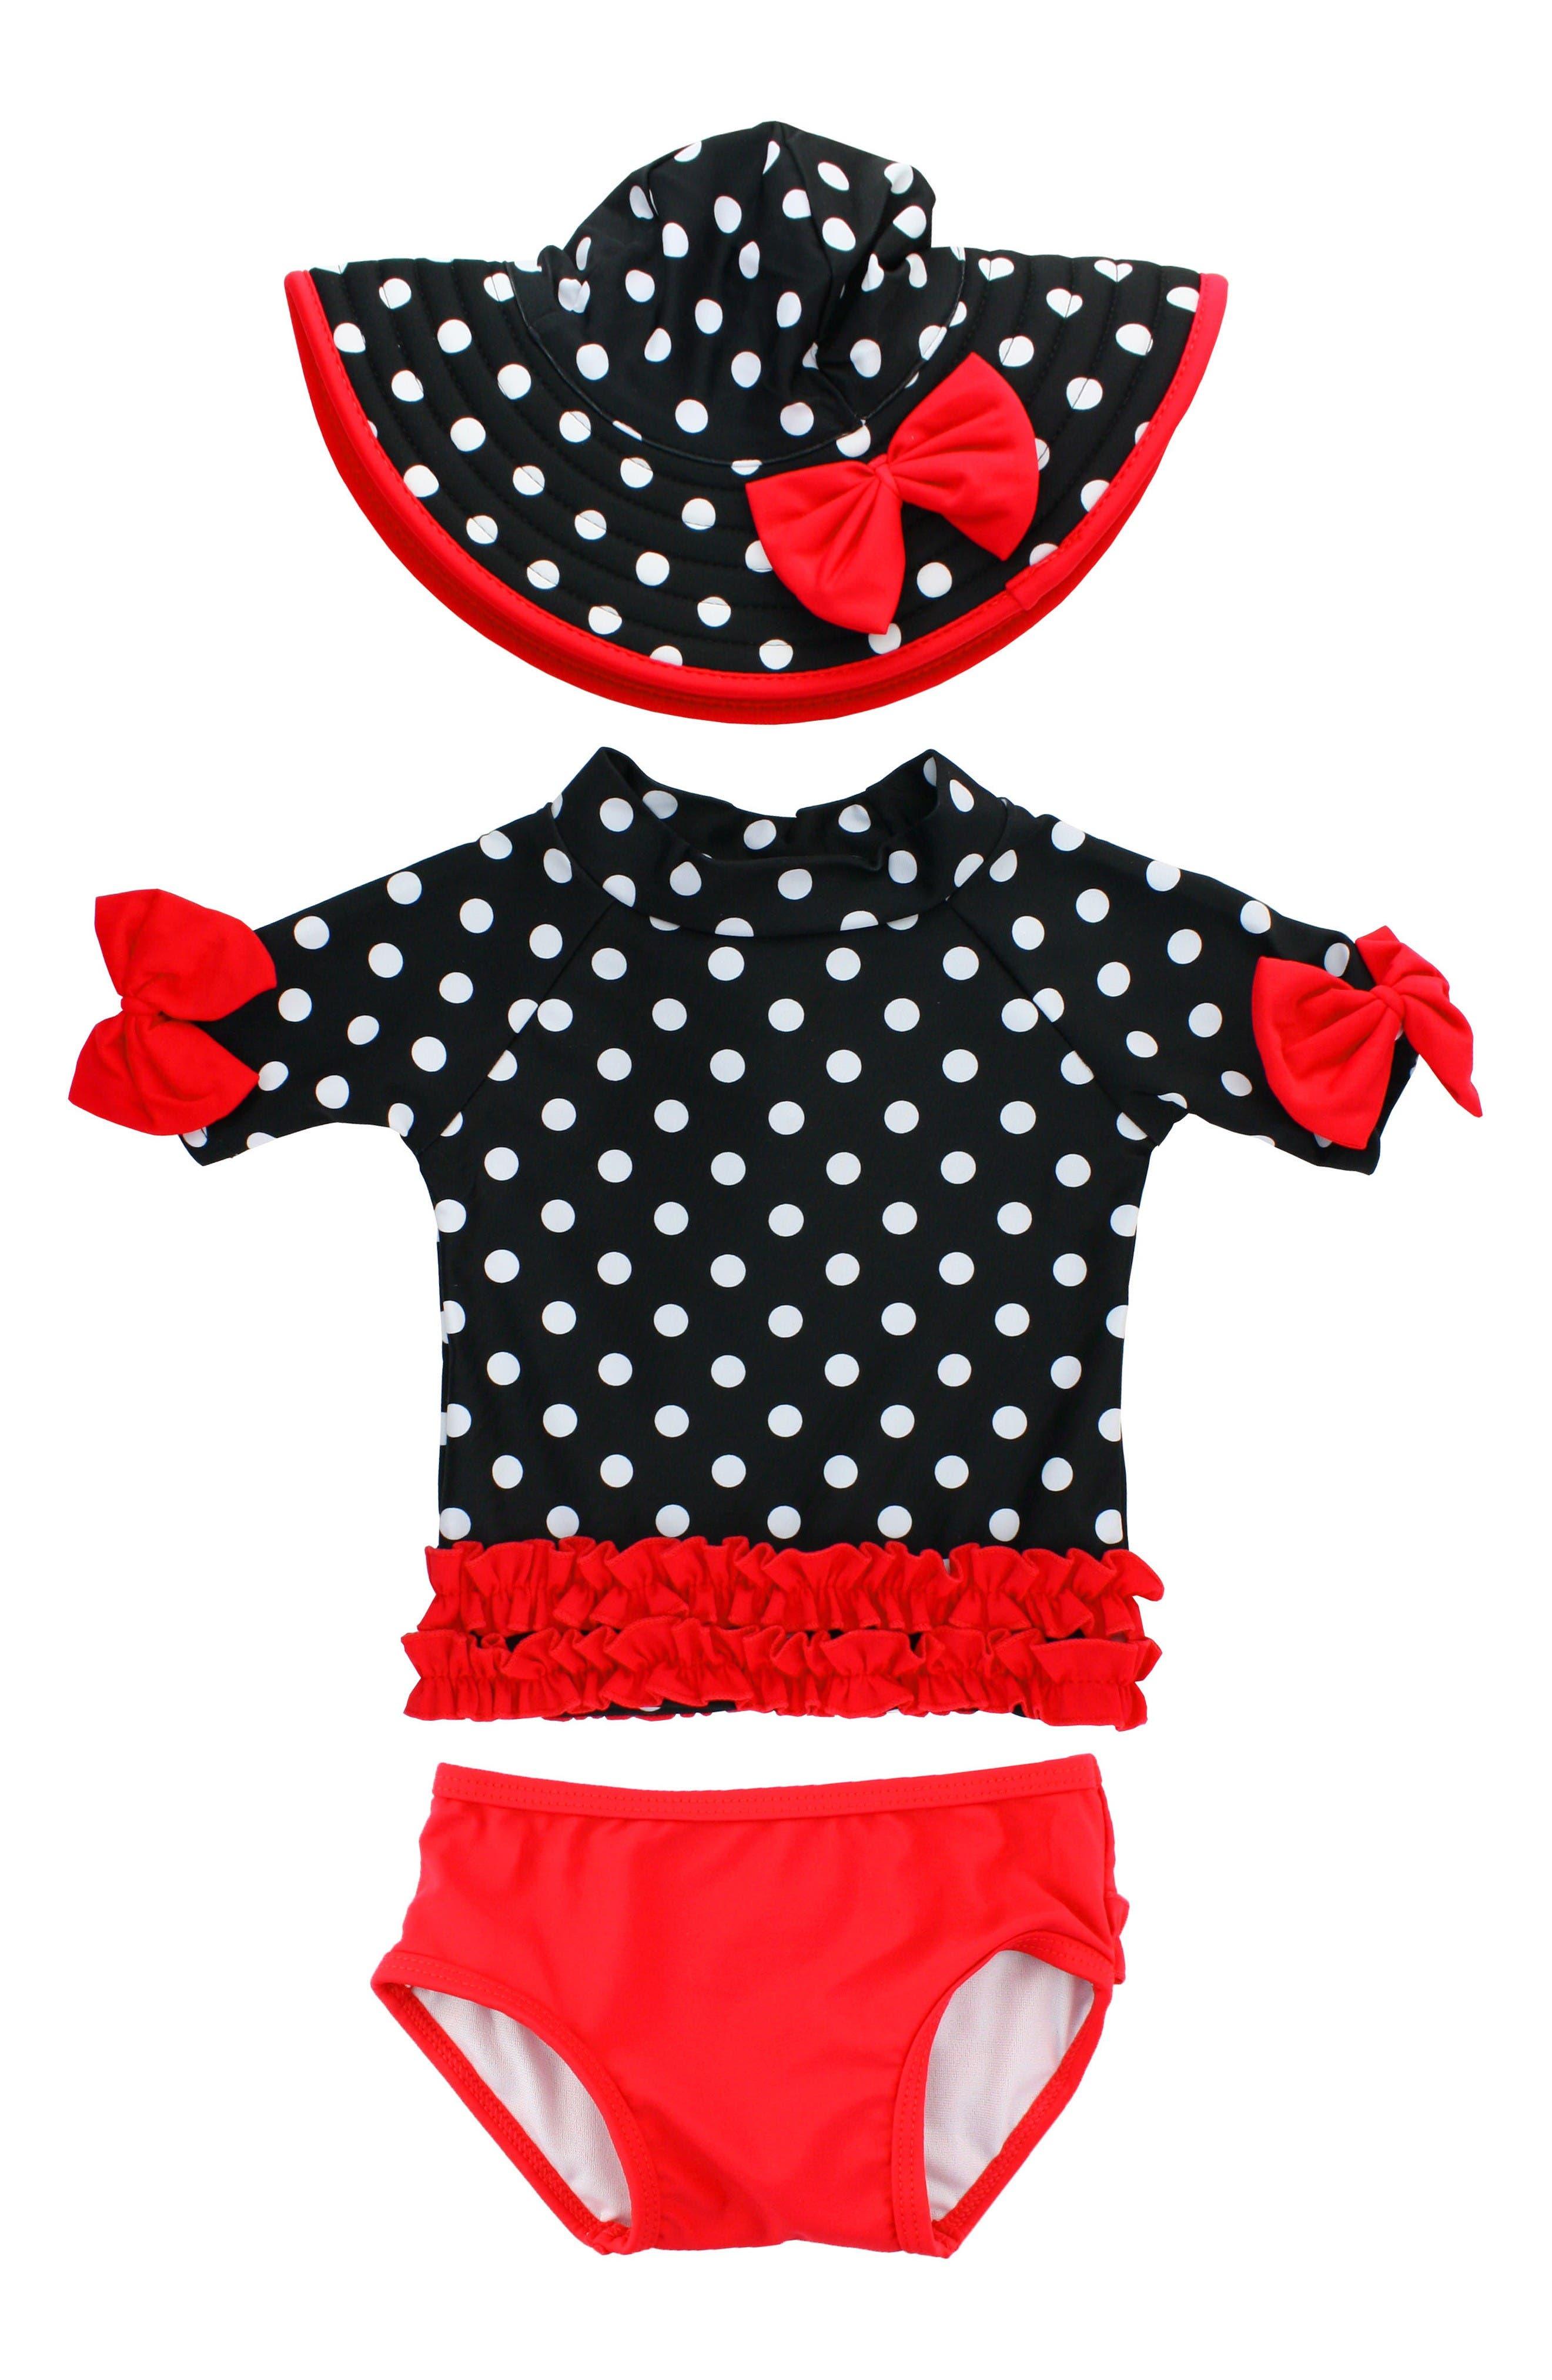 5354e98cfdb Baby Girl Swimwear: Swimsuits, Swim Trunks & Cover-Ups | Nordstrom